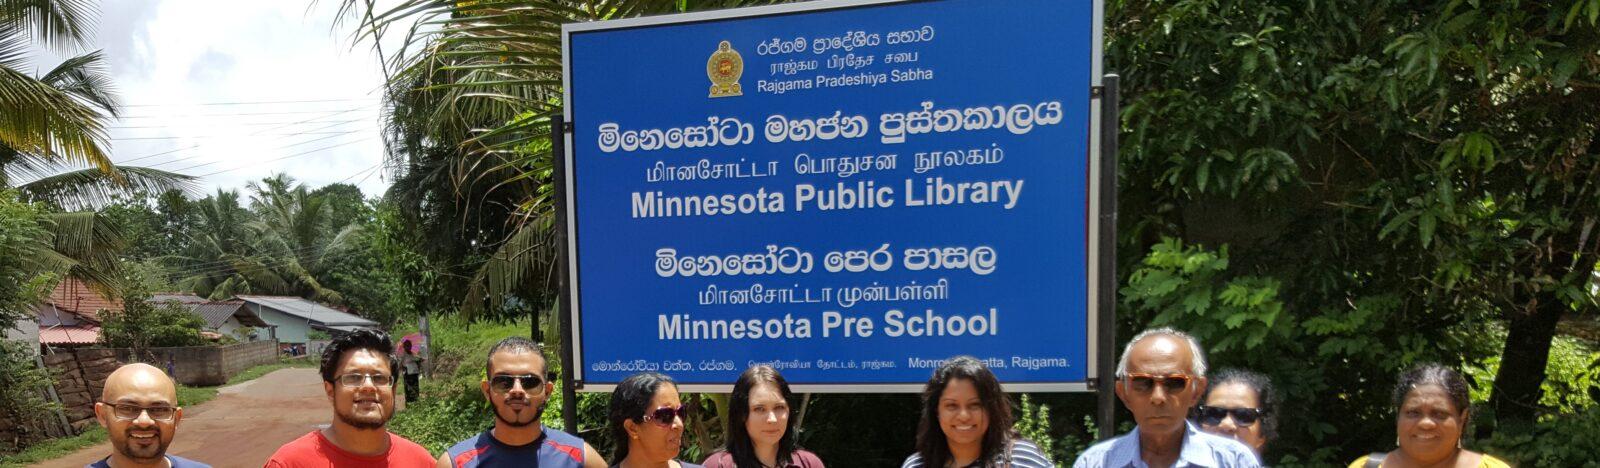 Minnesota Library and Preschool